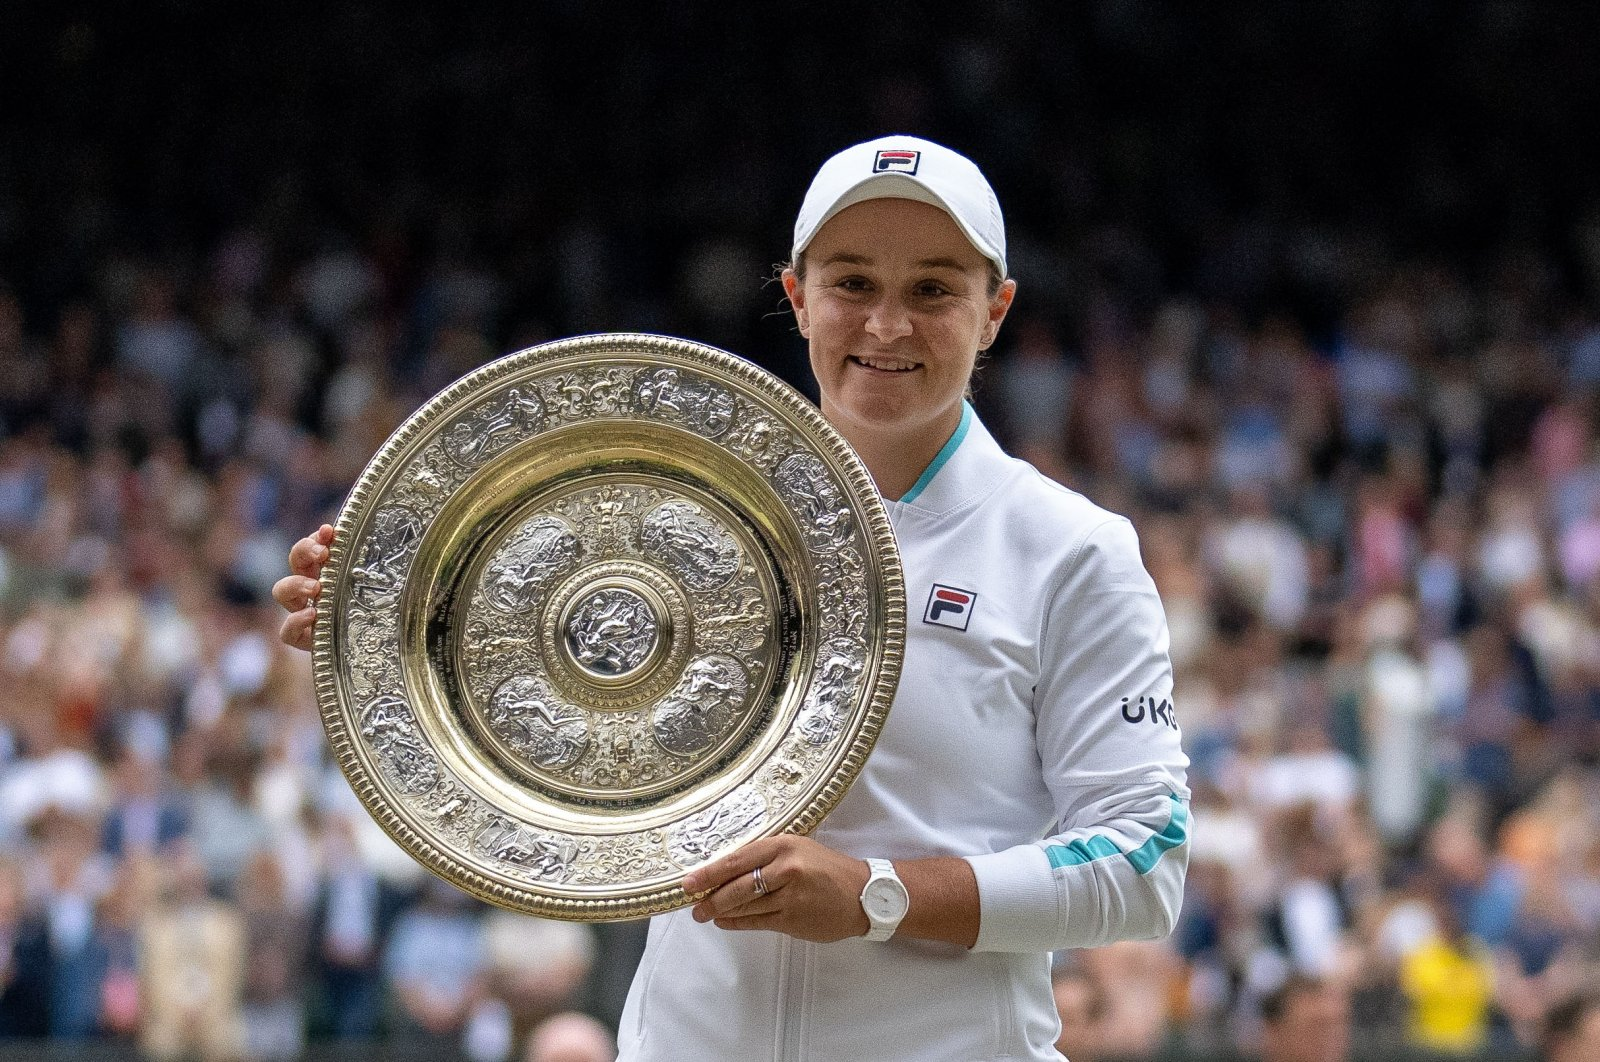 Australia's Ashleigh Barty poses as she celebrates with the trophy after winning the Wimbledon final against Czech Republic's Karolina Pliskova, All England Tennis Club, London, England, July 10, 2021.